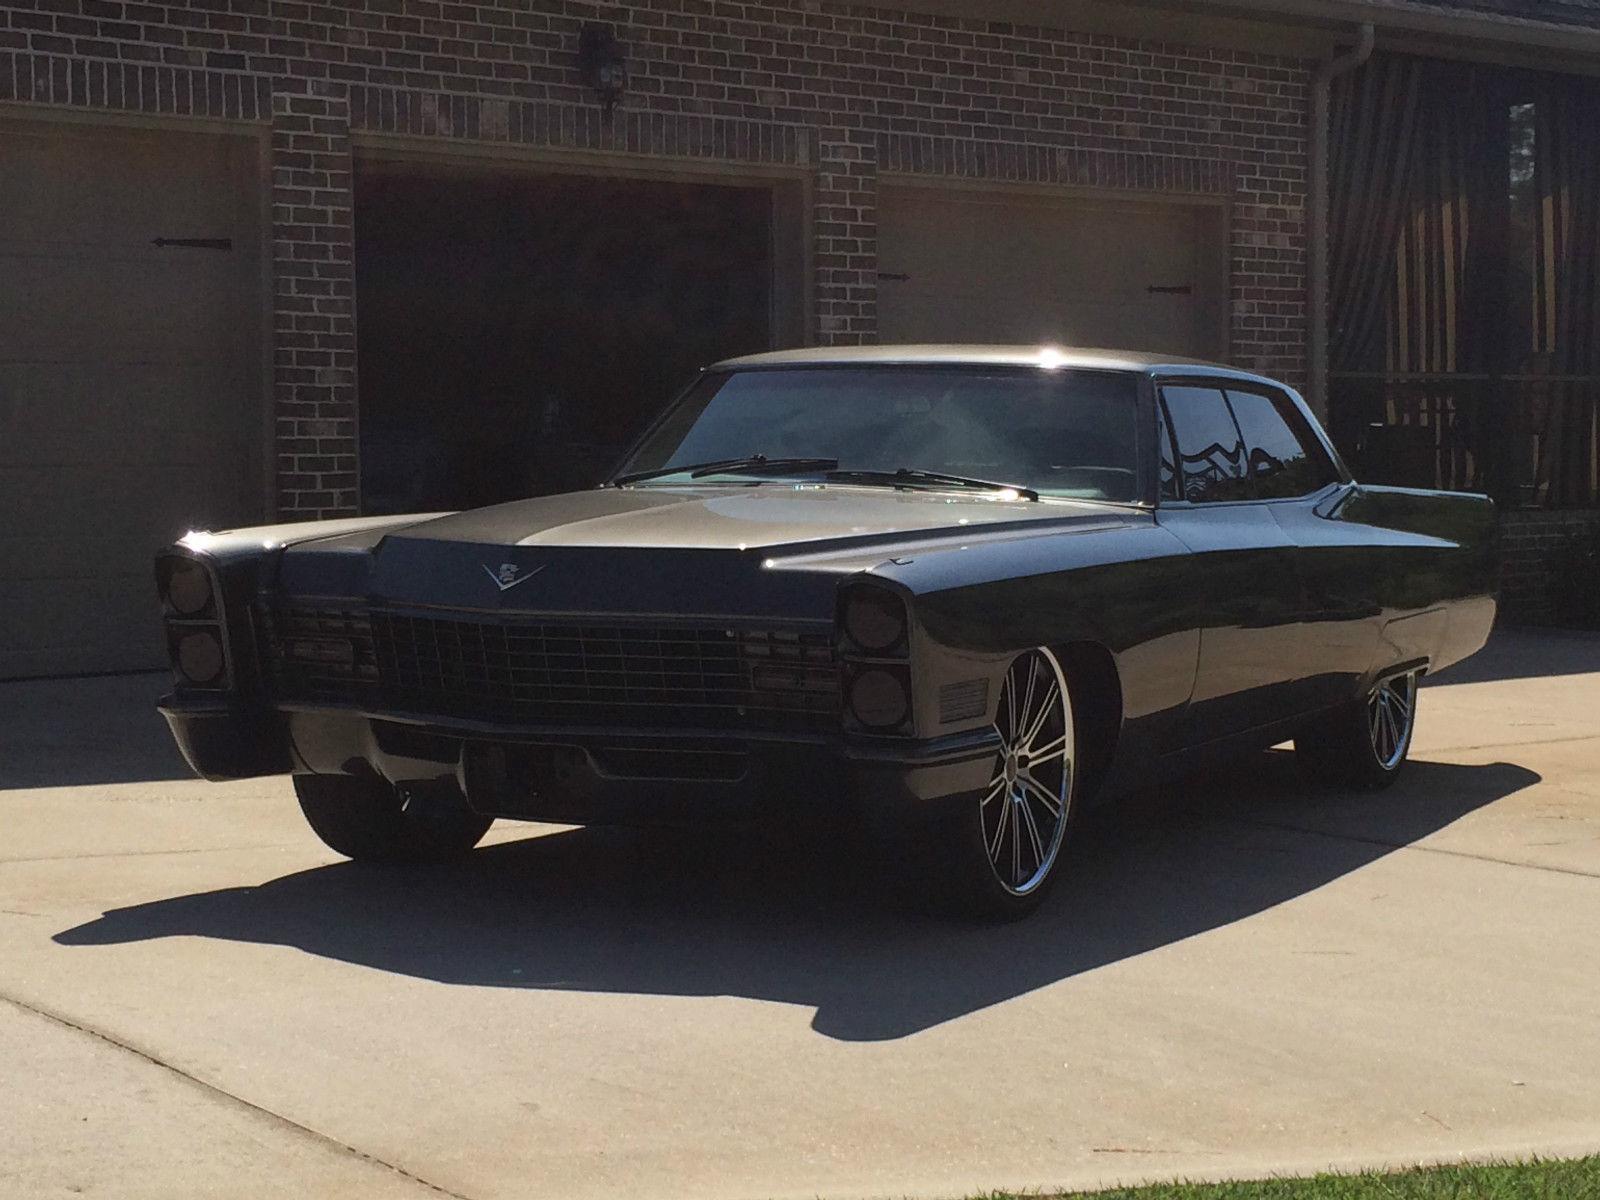 1967 Cadillac Deville Custom Hardtop 4